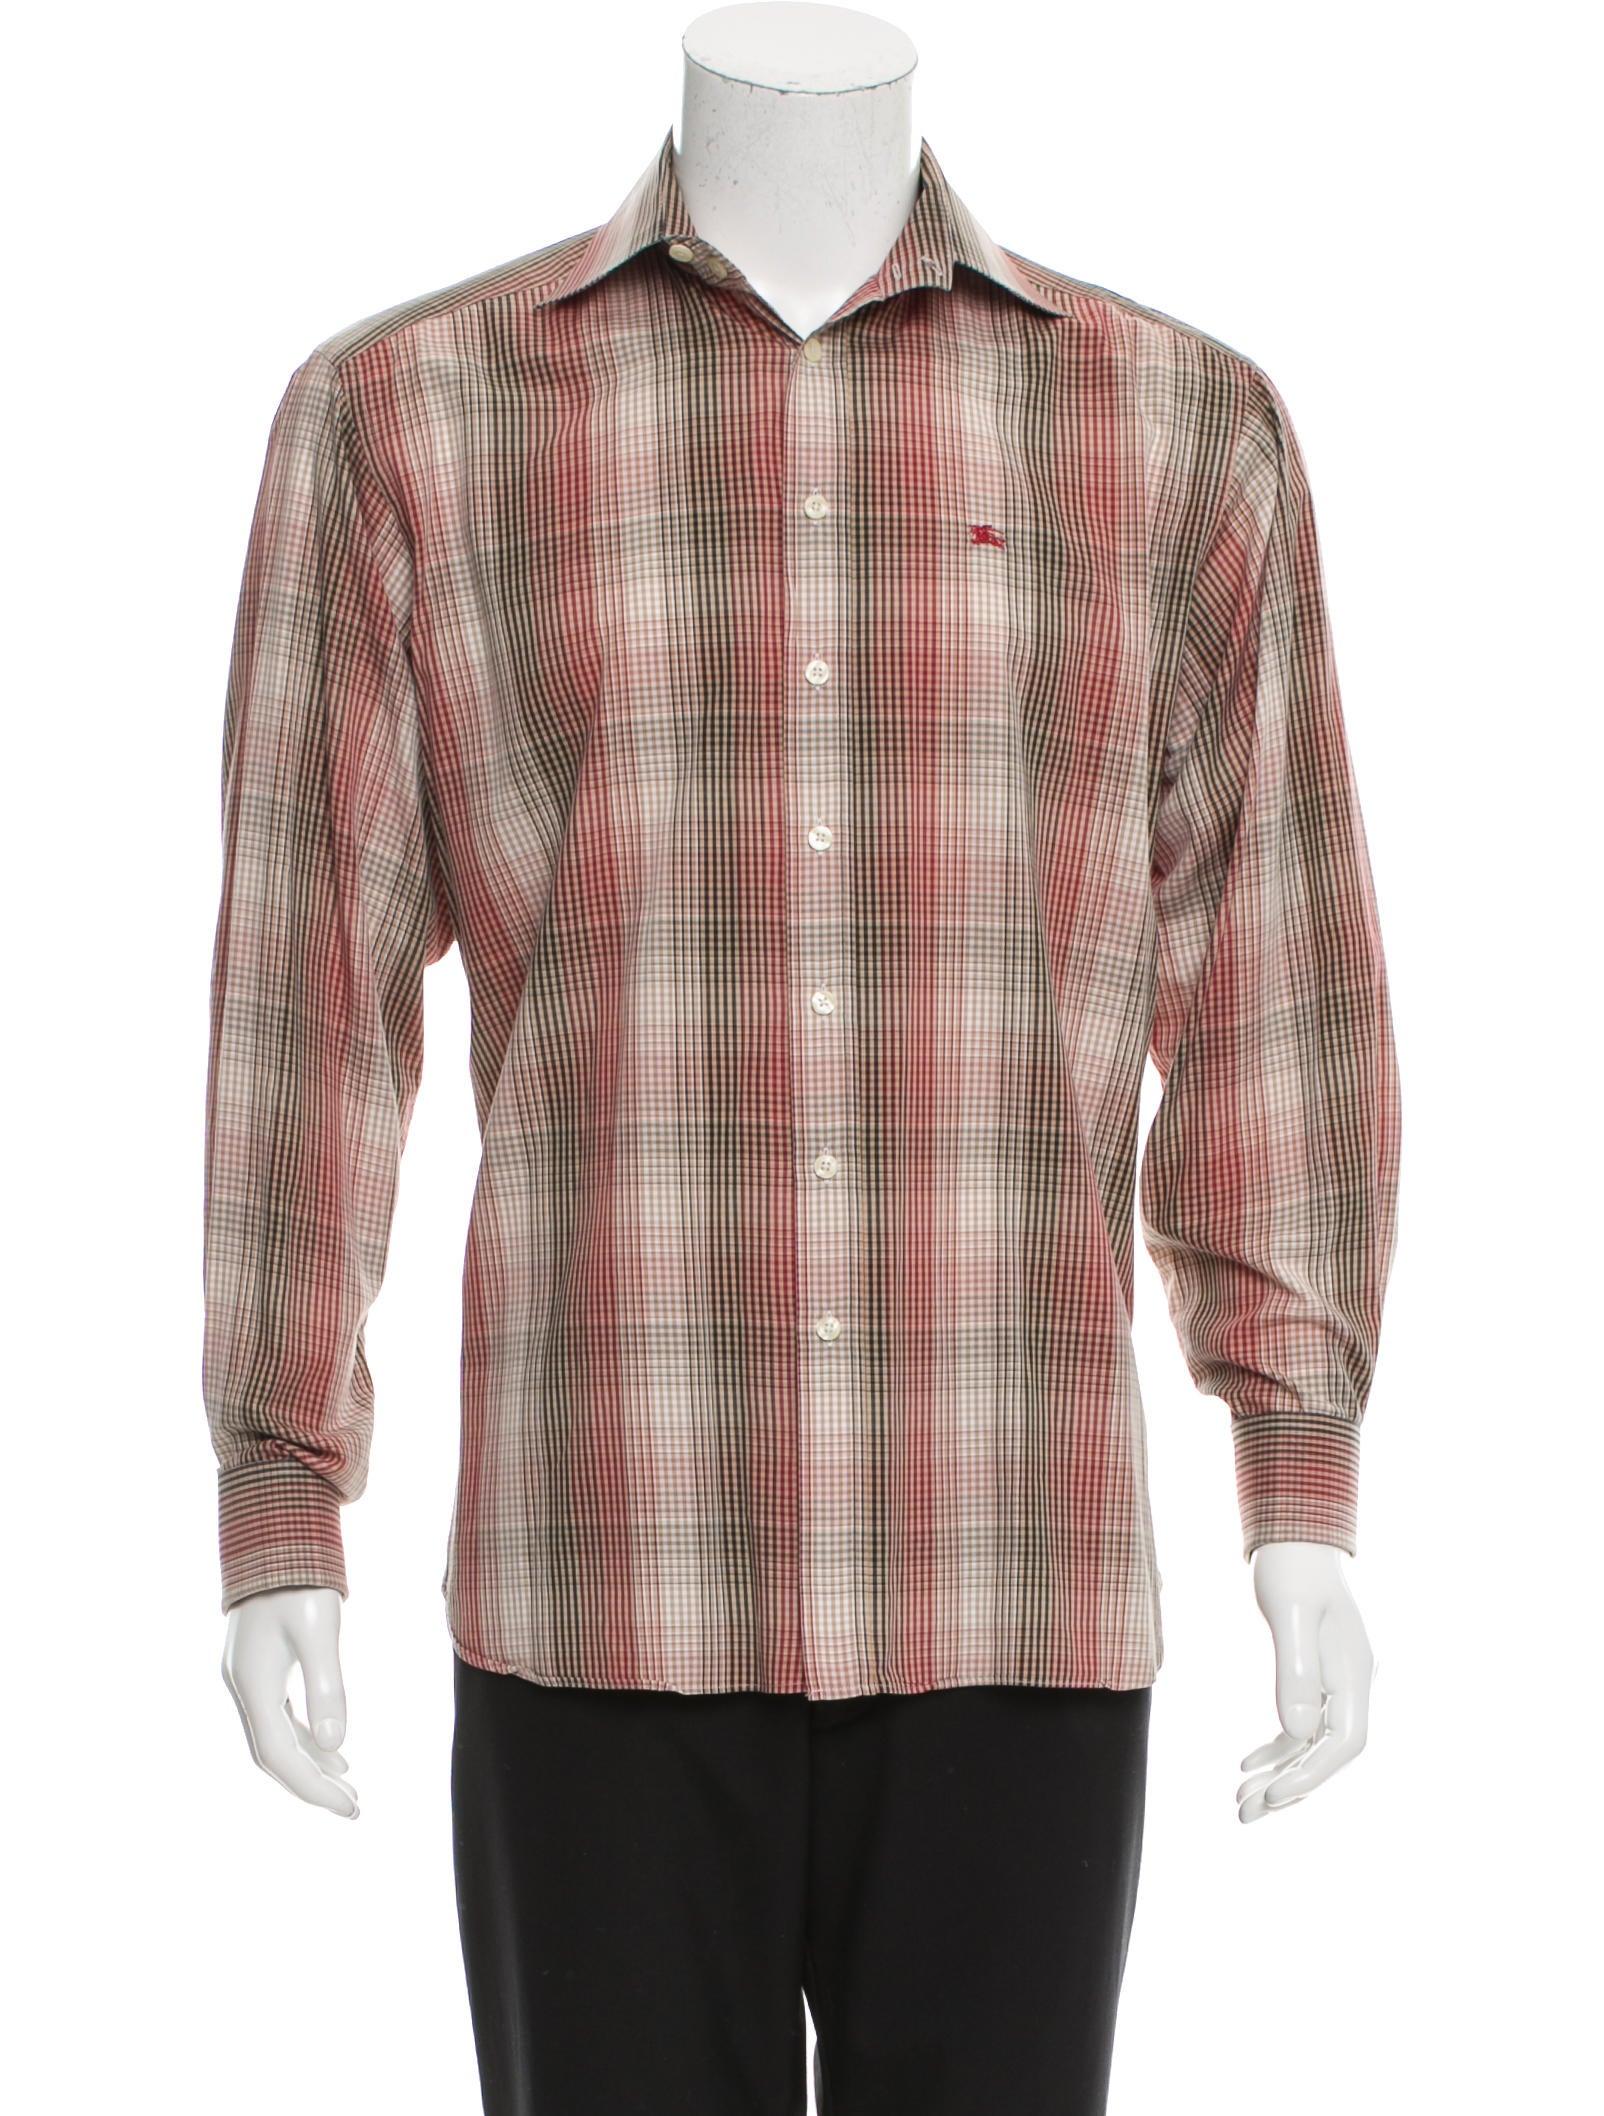 Burberry London French Cuff Plaid Shirt Clothing